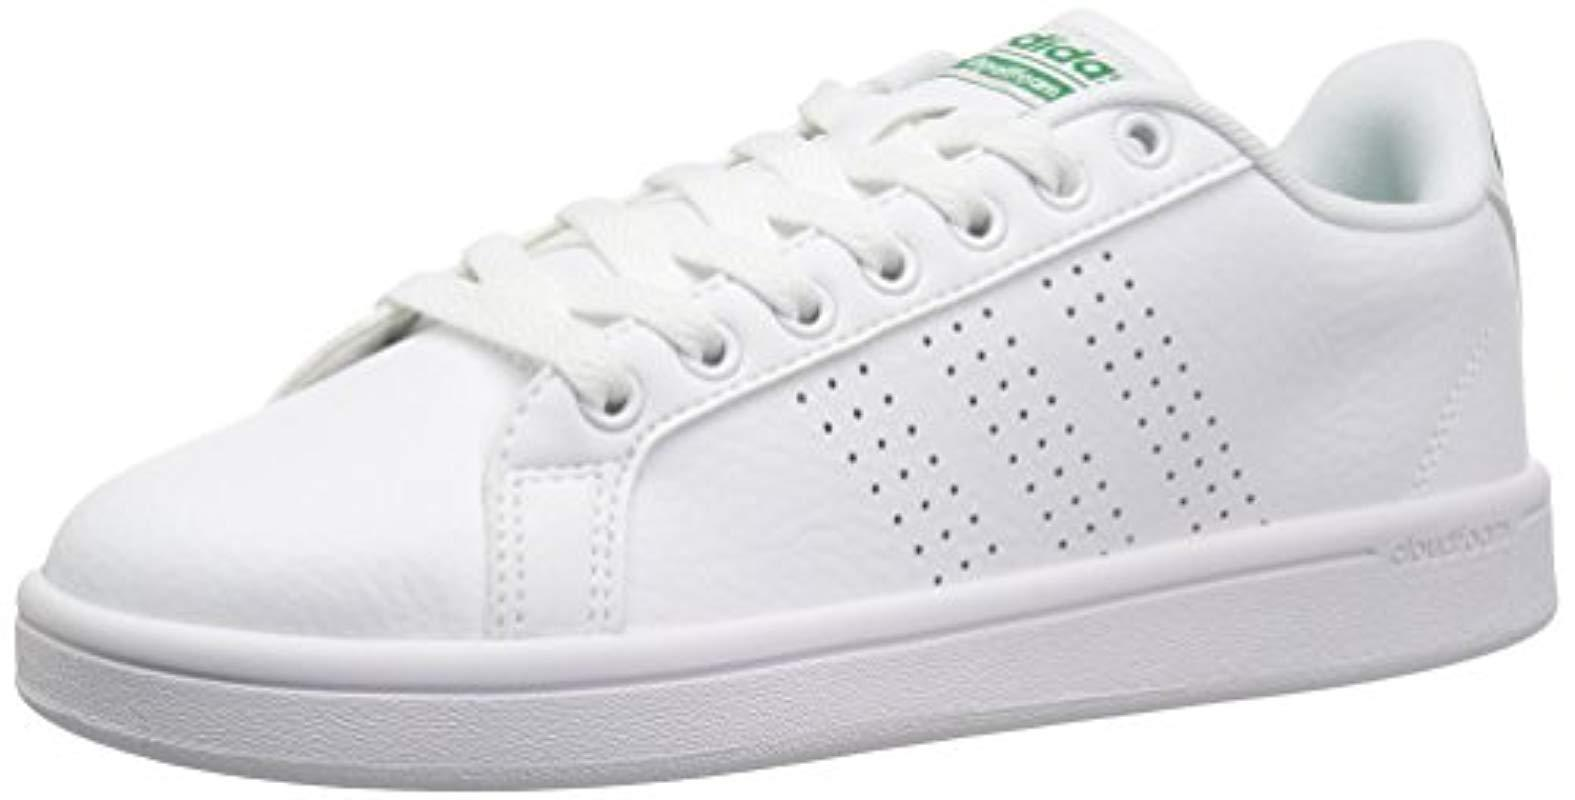 6477a811510a8 Lyst - adidas Originals Adidas Cloudfoam Advantage Clean Sneaker in ...